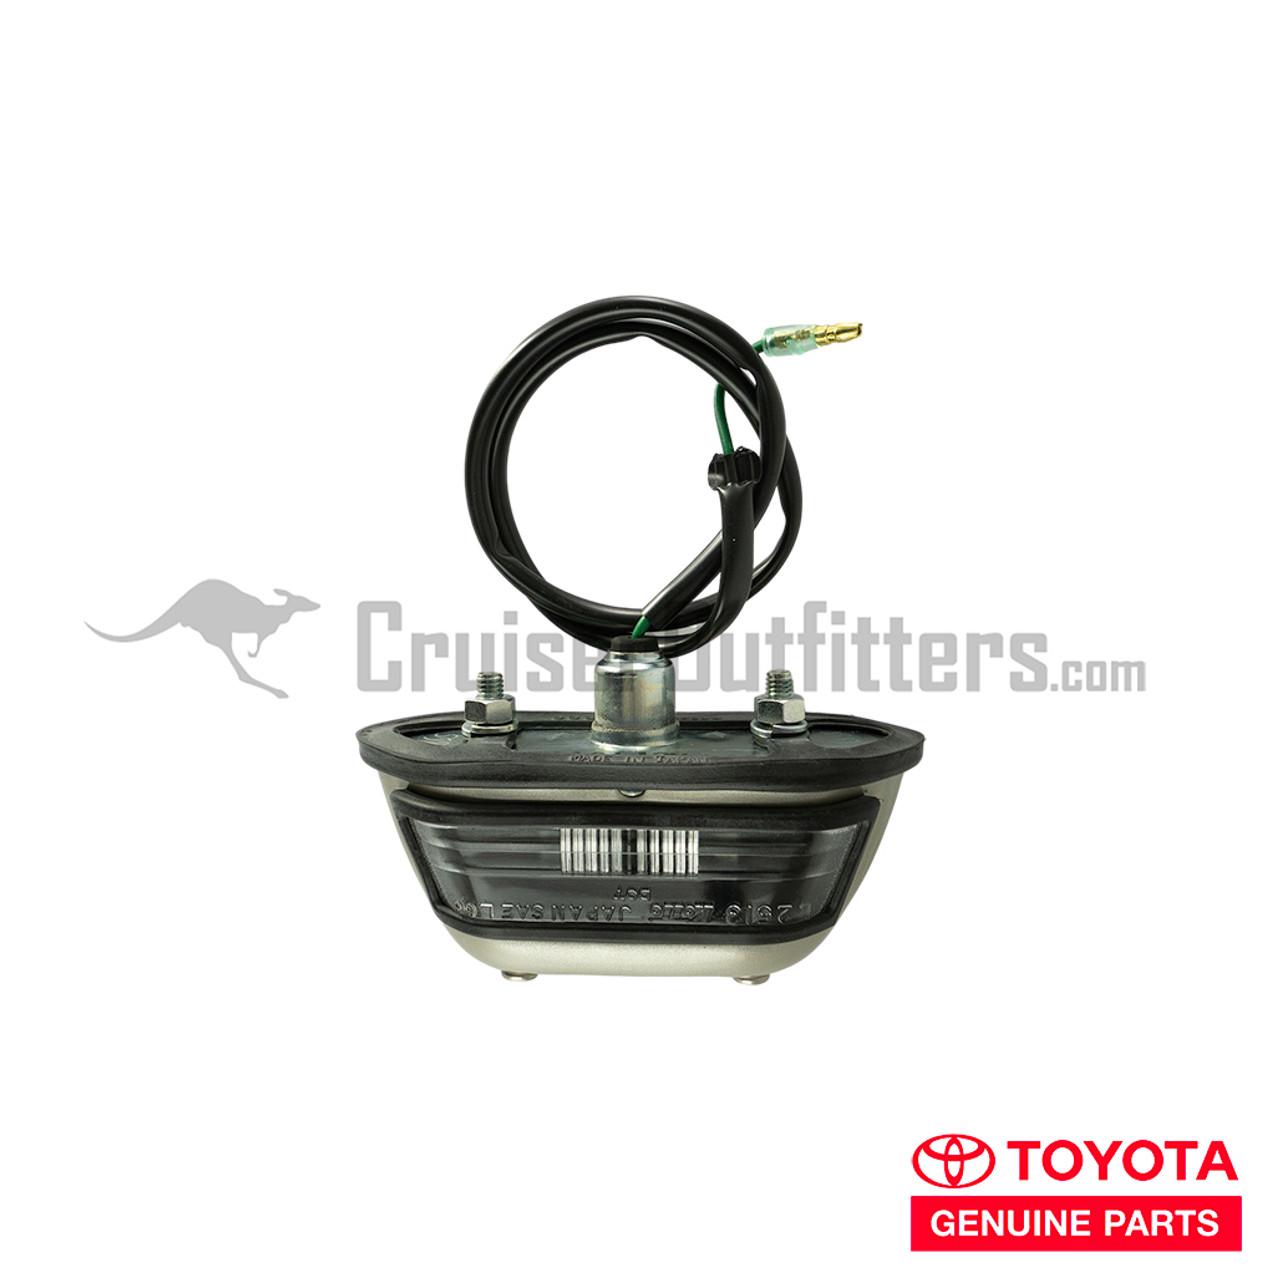 License Plate Light - OEM Toyota - Fits 4x Series (RLT60020)